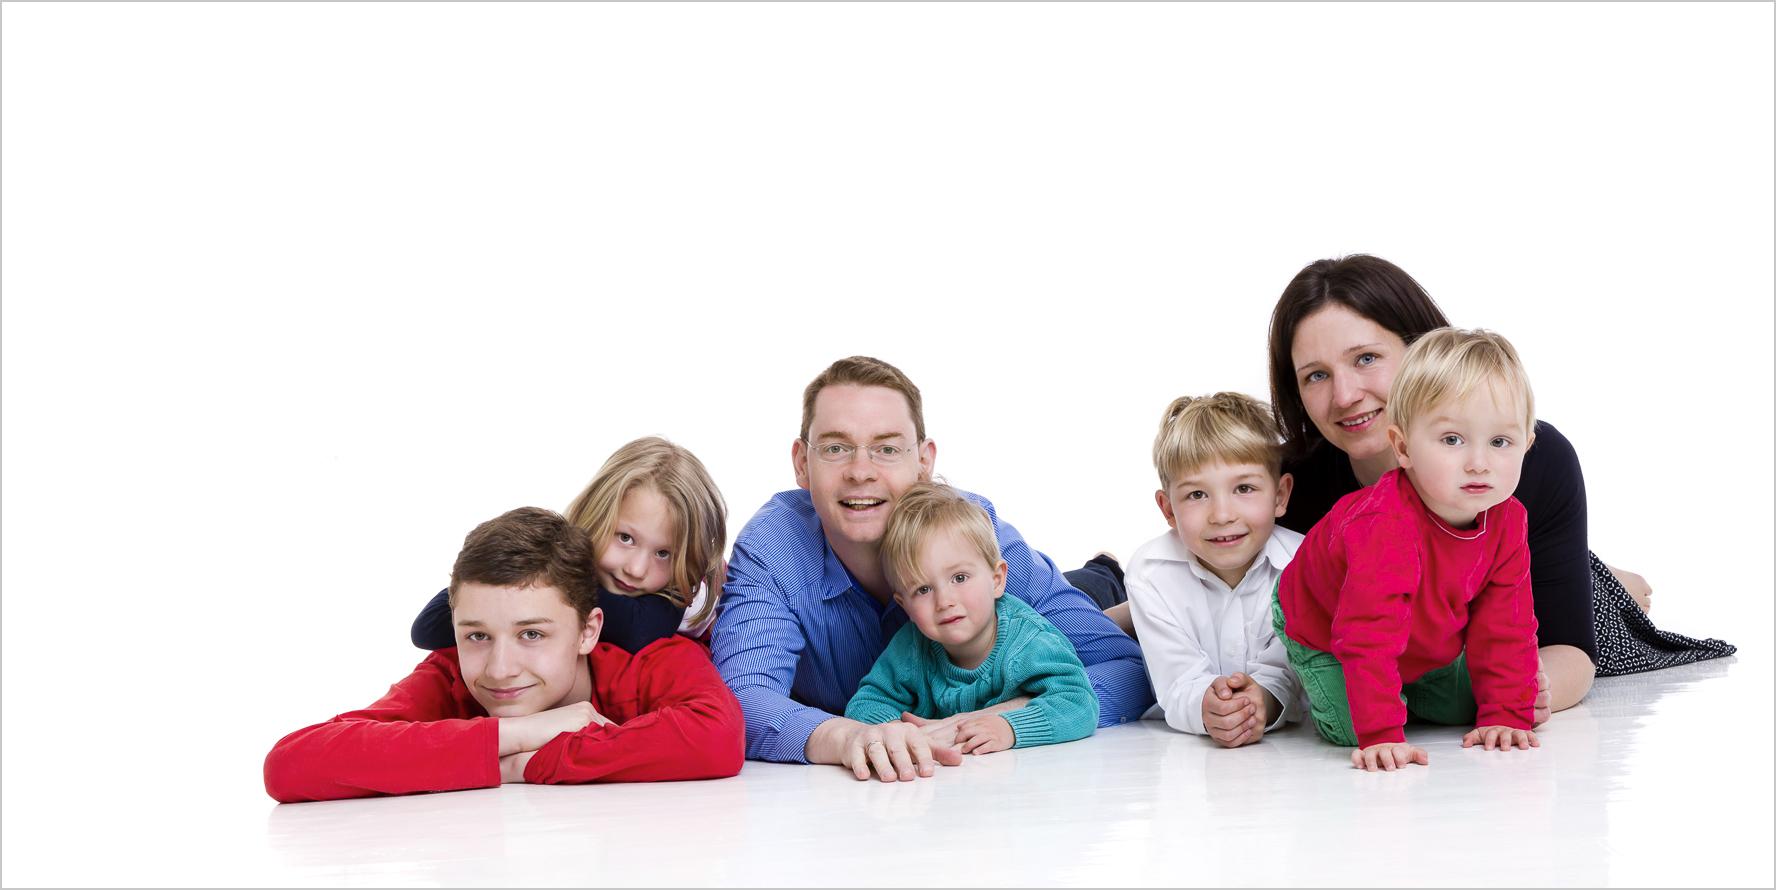 Familienfotografie grosse Familie auf dem Boden im Studio